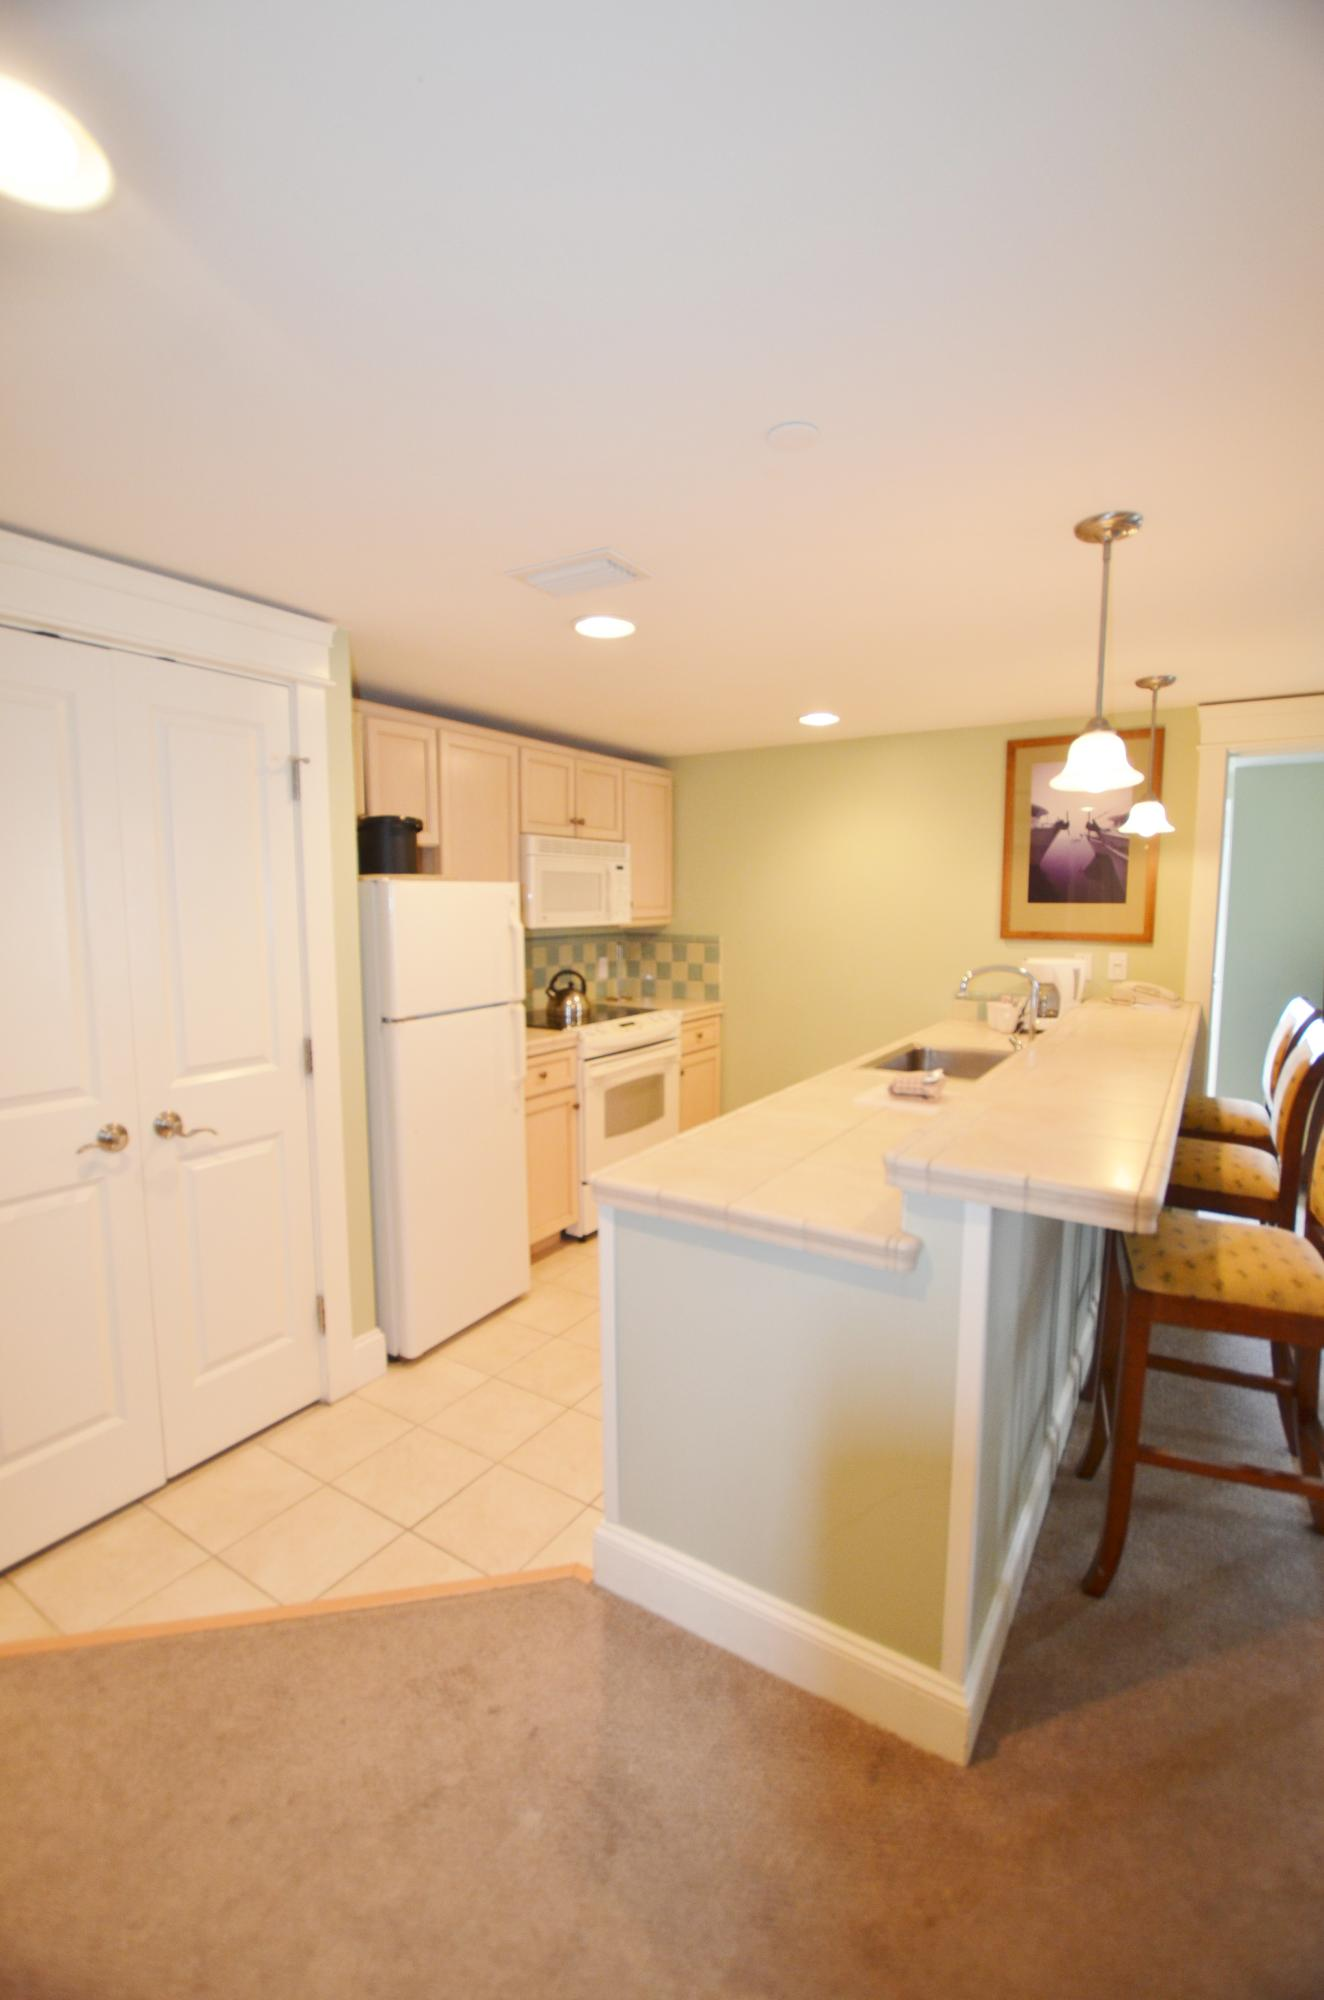 A 2 Bedroom 2 Bedroom Grand Sandestin The Rental